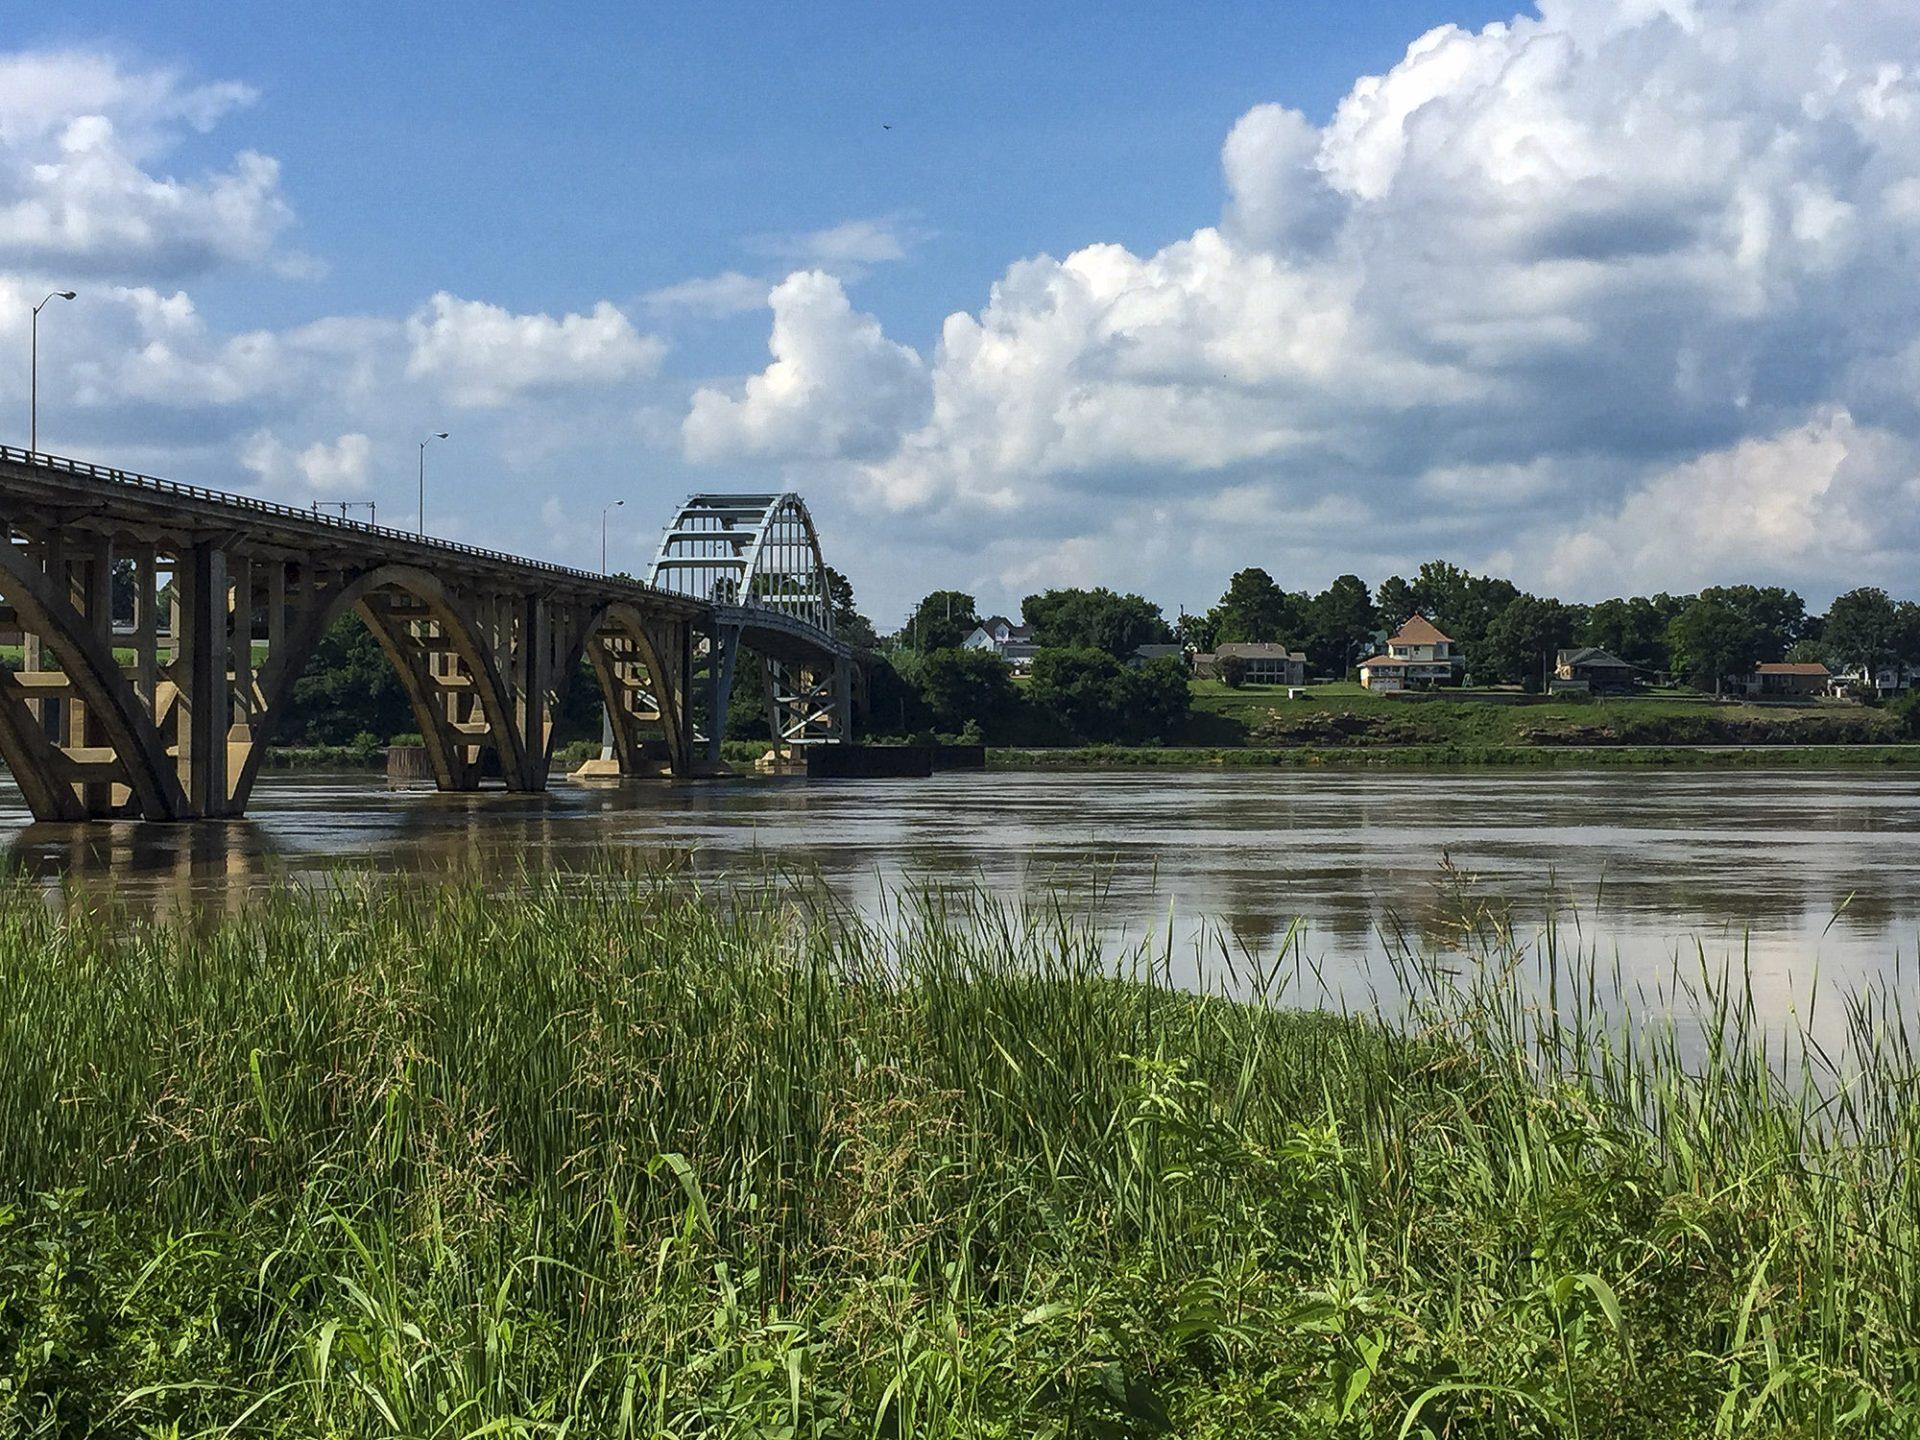 Arkansas River in Ozark, Arkansas